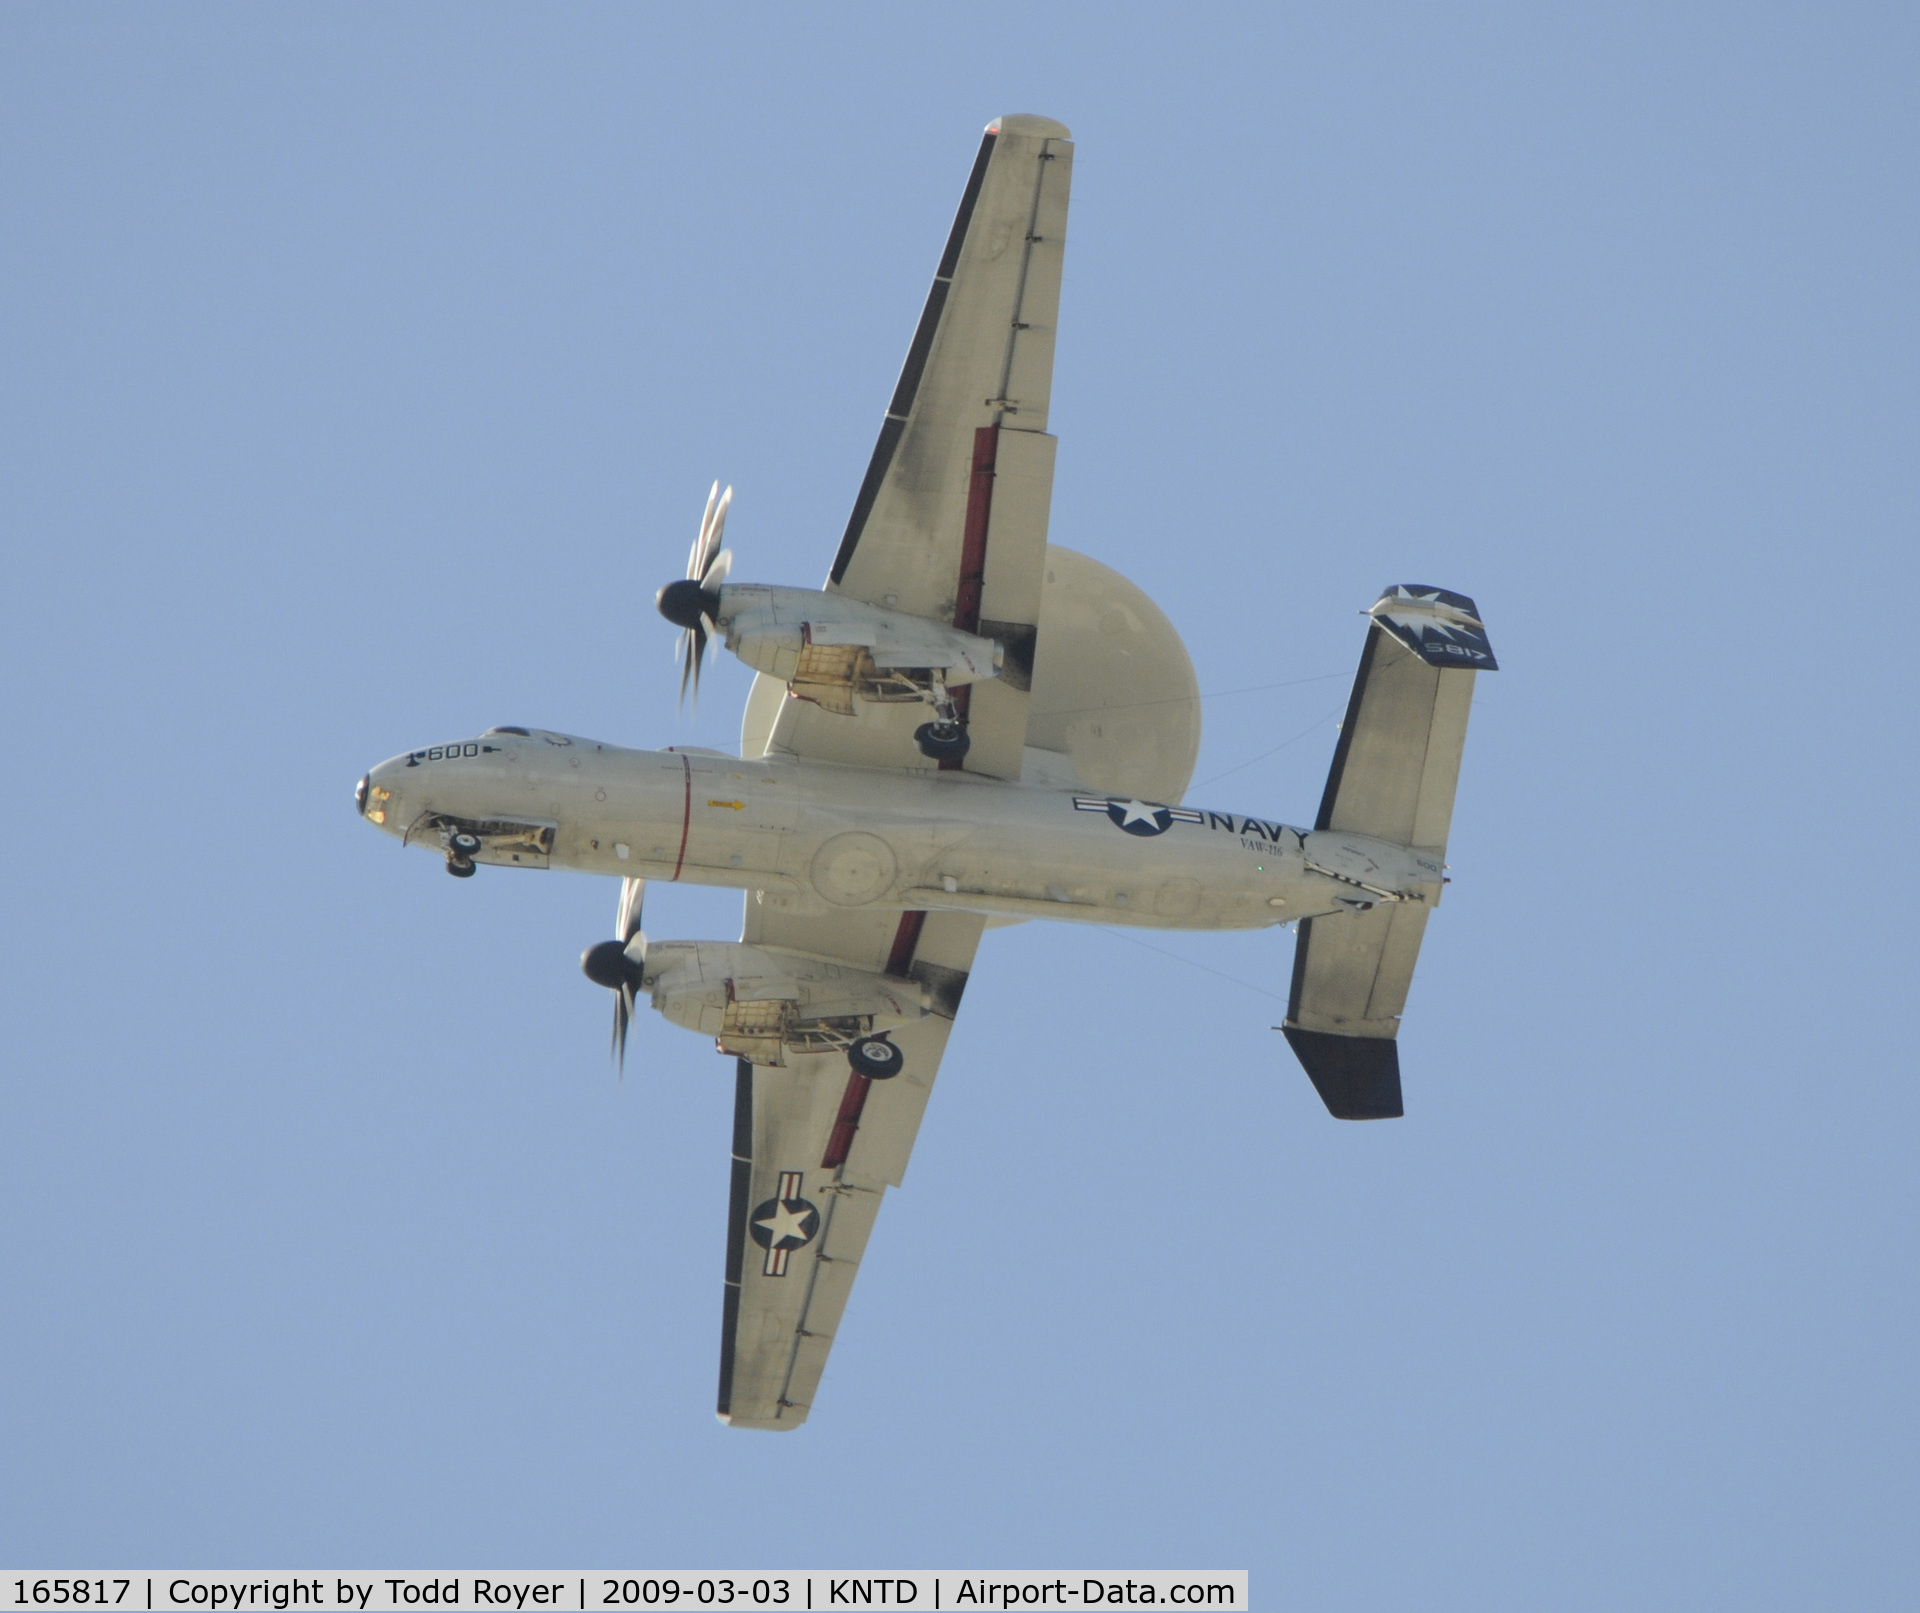 165817, 2000 Northrop Grumman E-2C Hawkeye C/N A188, From the backyard